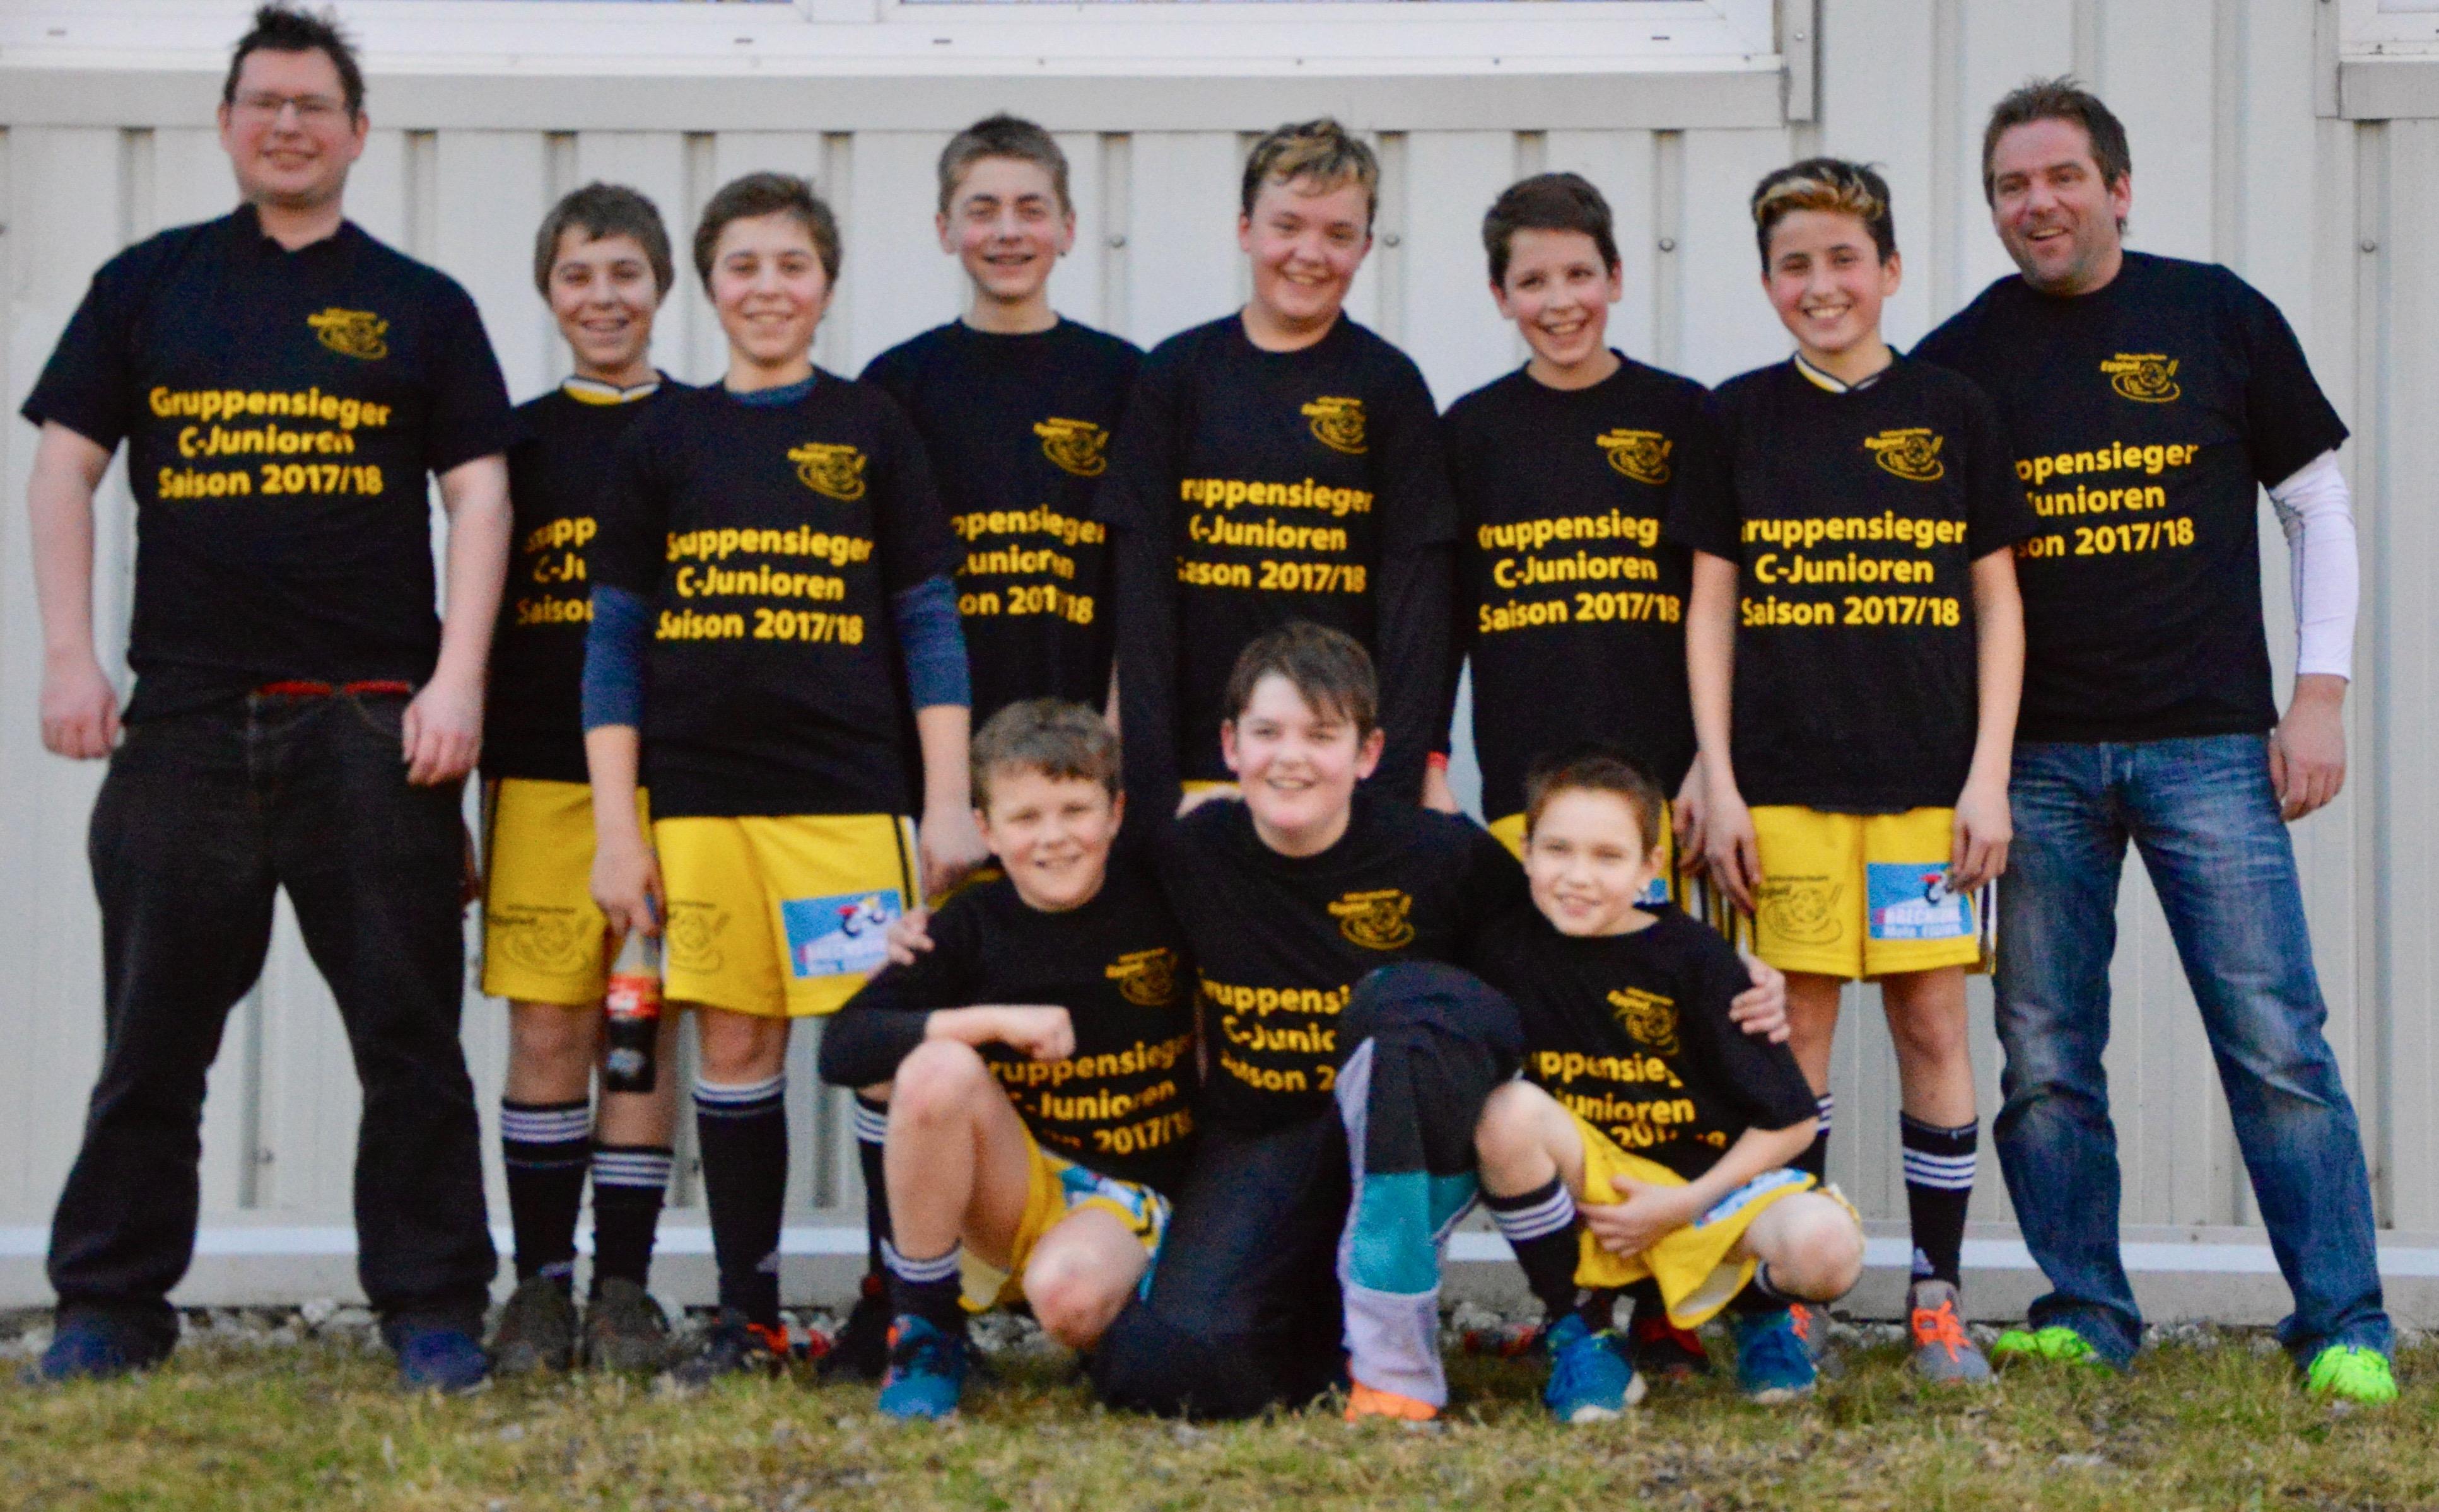 Junioren C - Gruppensieg Saison 2017/18